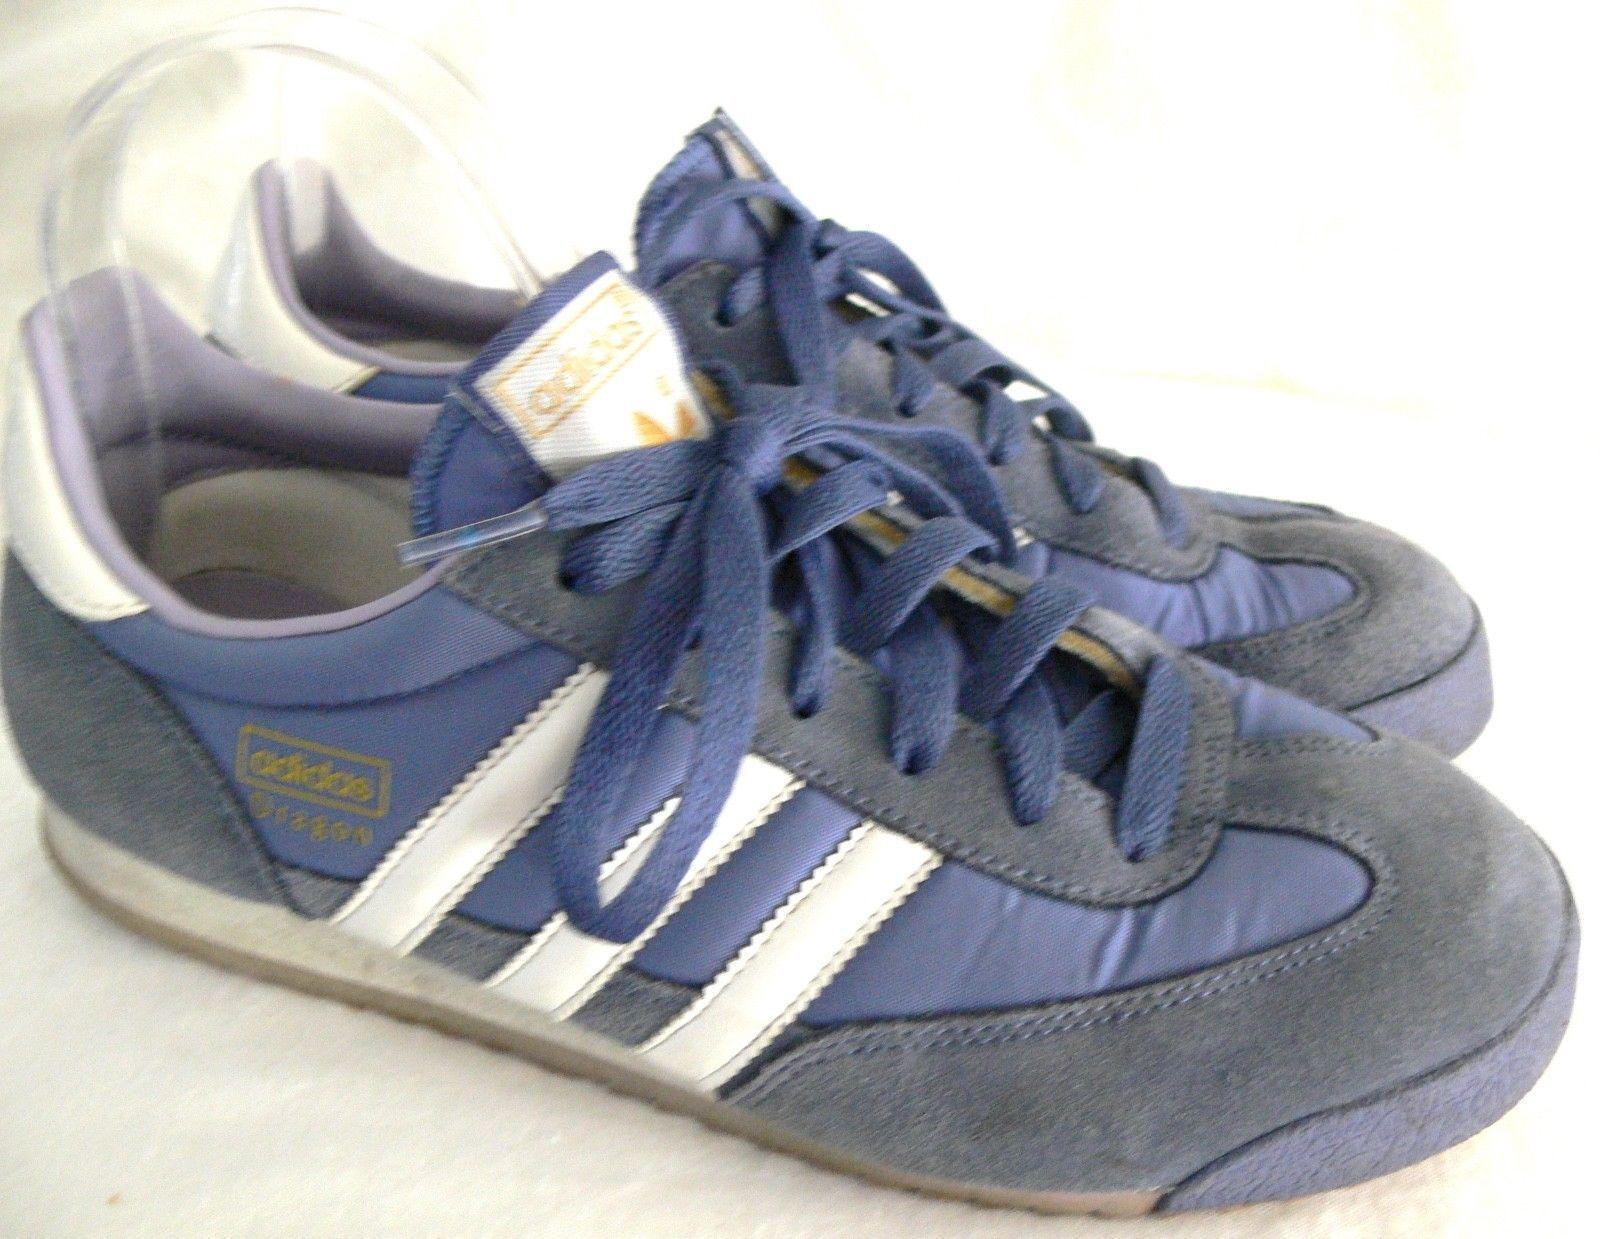 17505275eb7823 Adidas Dragon Shoes Shoes Shoes Blue Mens US 7 JP 240 Original Sneakers  Dragons 196586